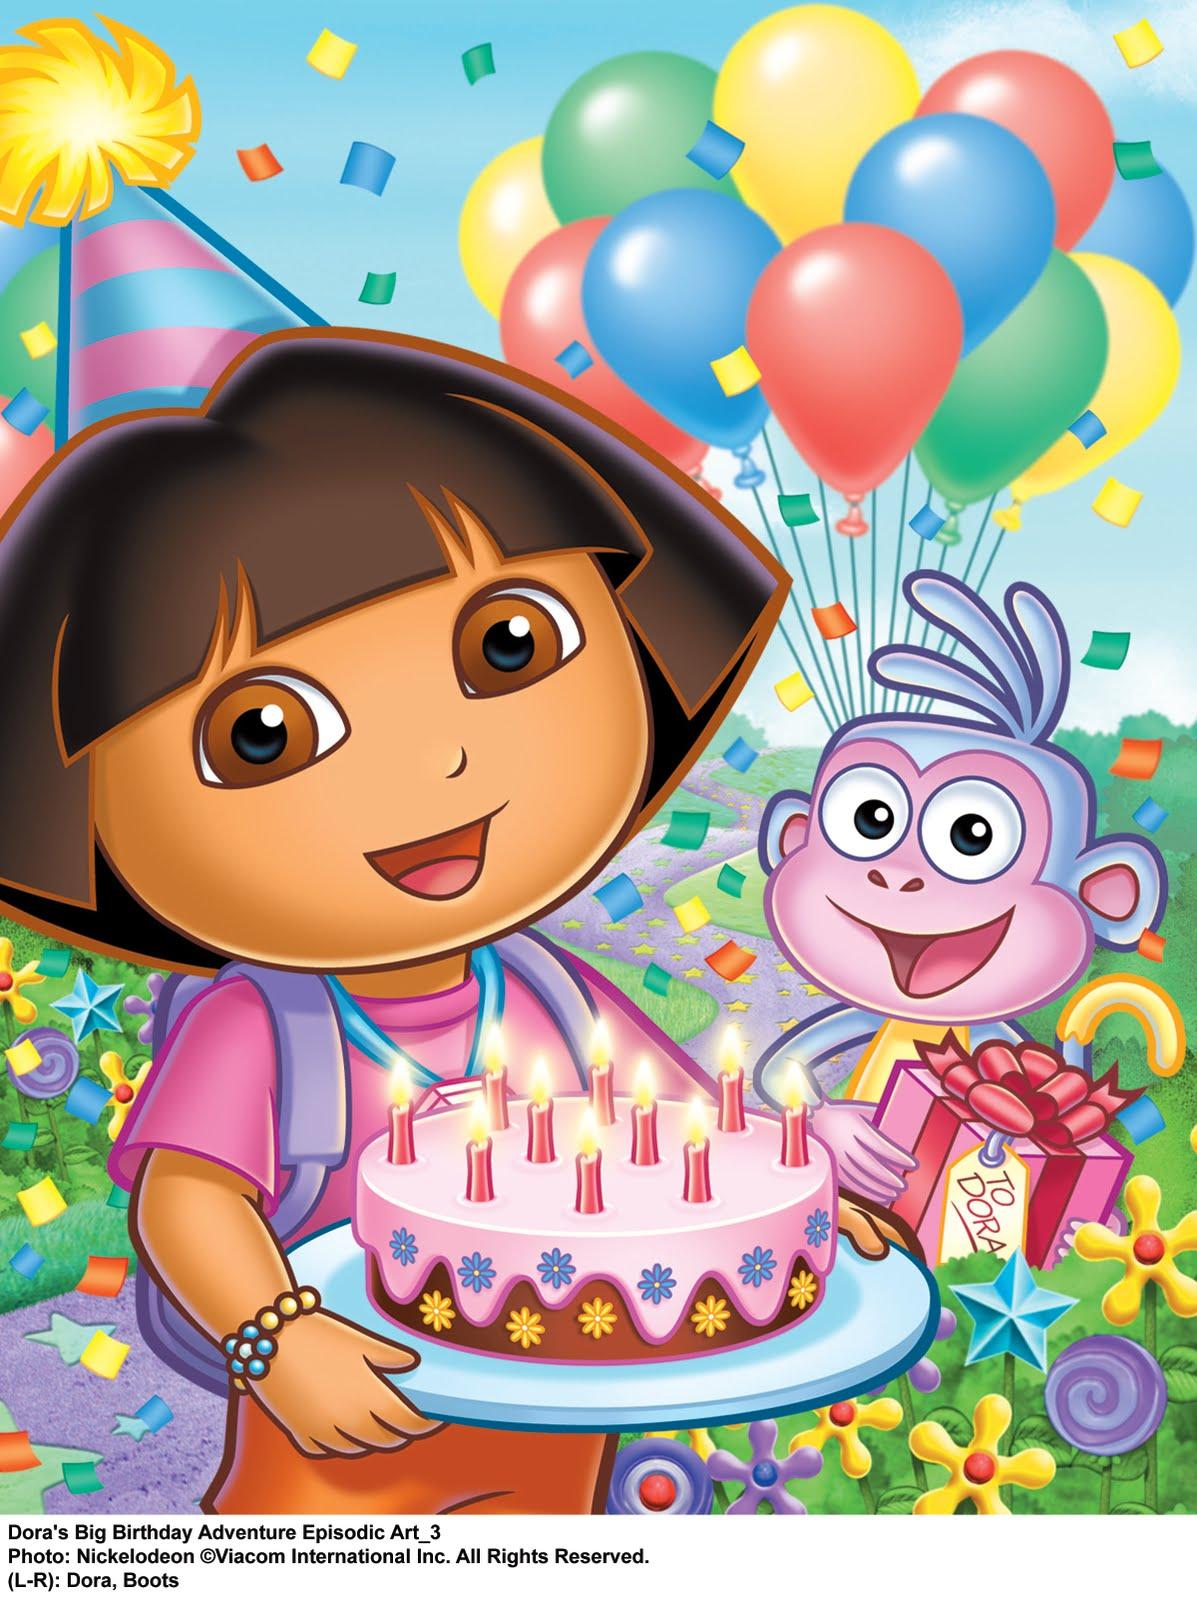 Tune In For Quot Dora S Big Birthday Adventure Tonight At 8pm